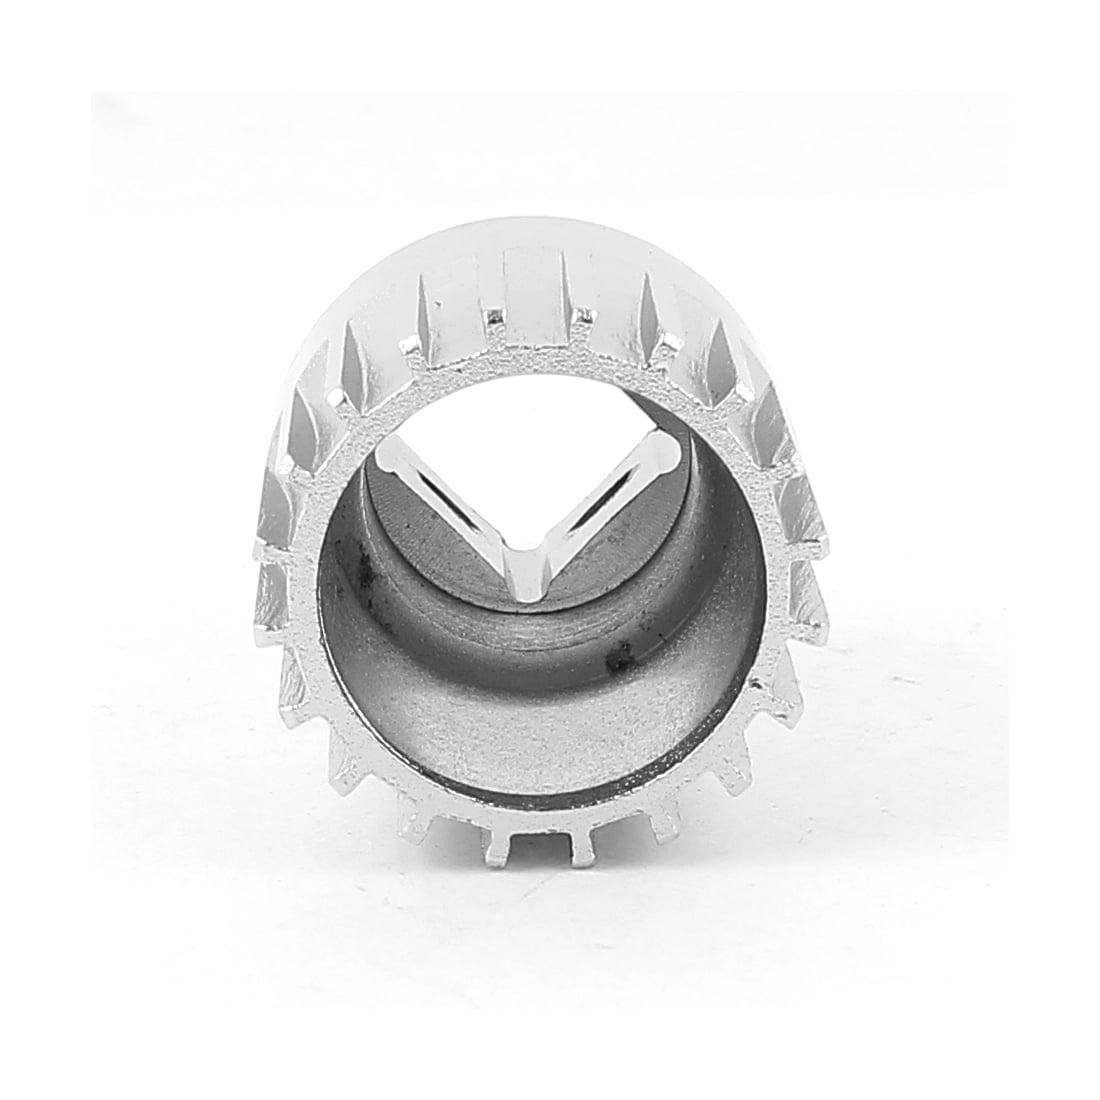 2 Pcs Bicycle Crank Extractor Remover Bottom Bracket Repair Tool 20 Teeth - image 1 of 3